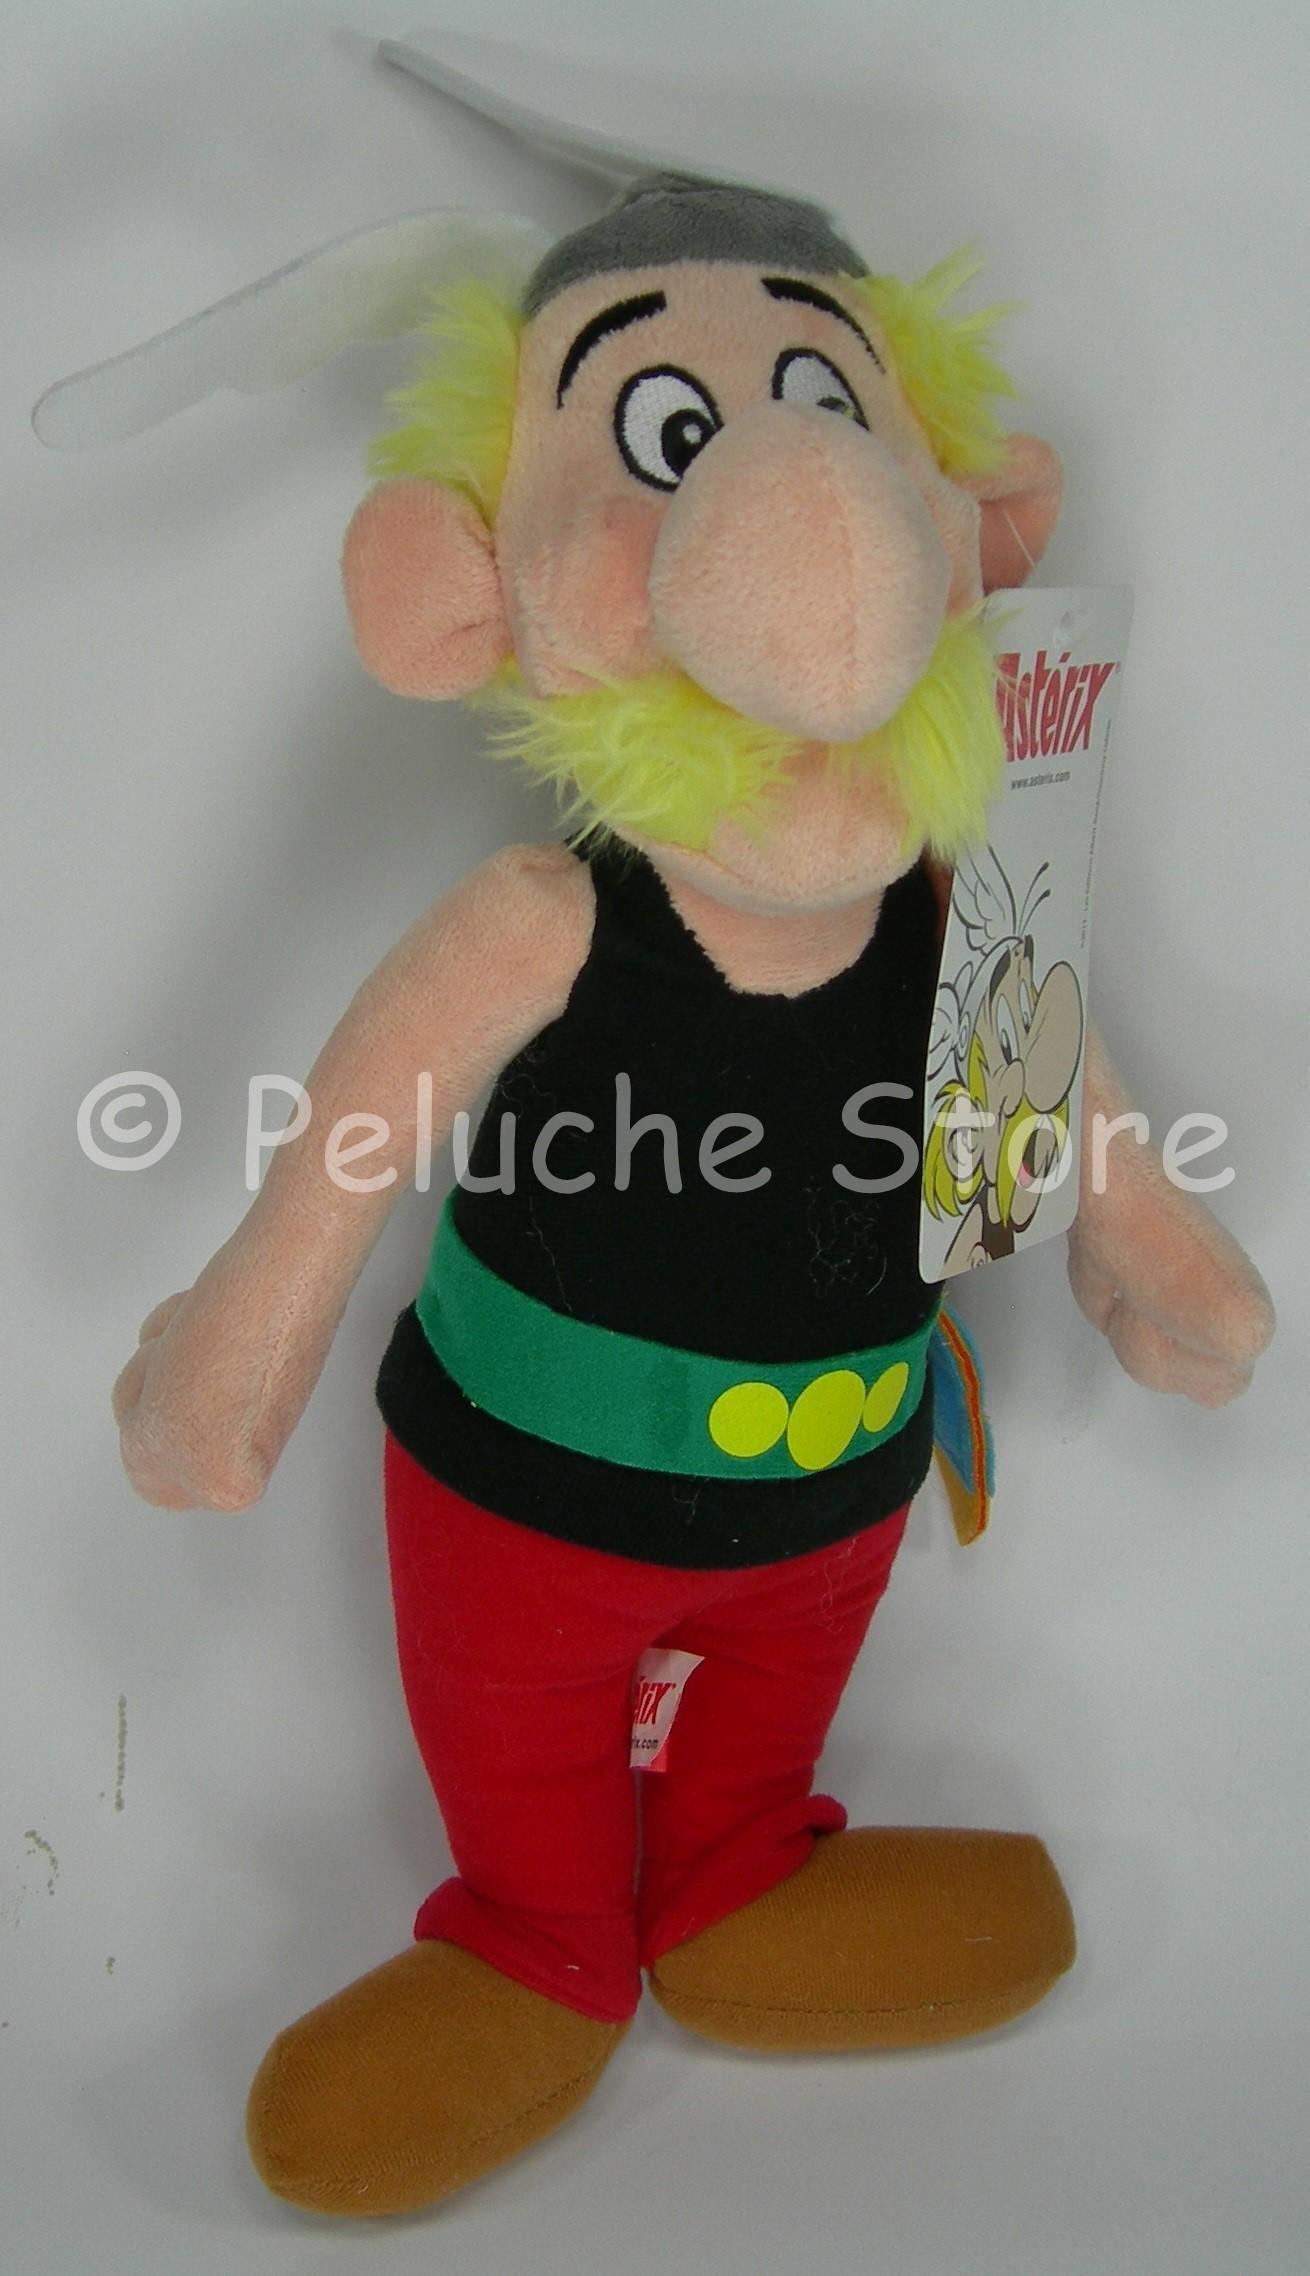 Asterix Obelix Idefix peluche 35 cm Qualità Velluto Originale